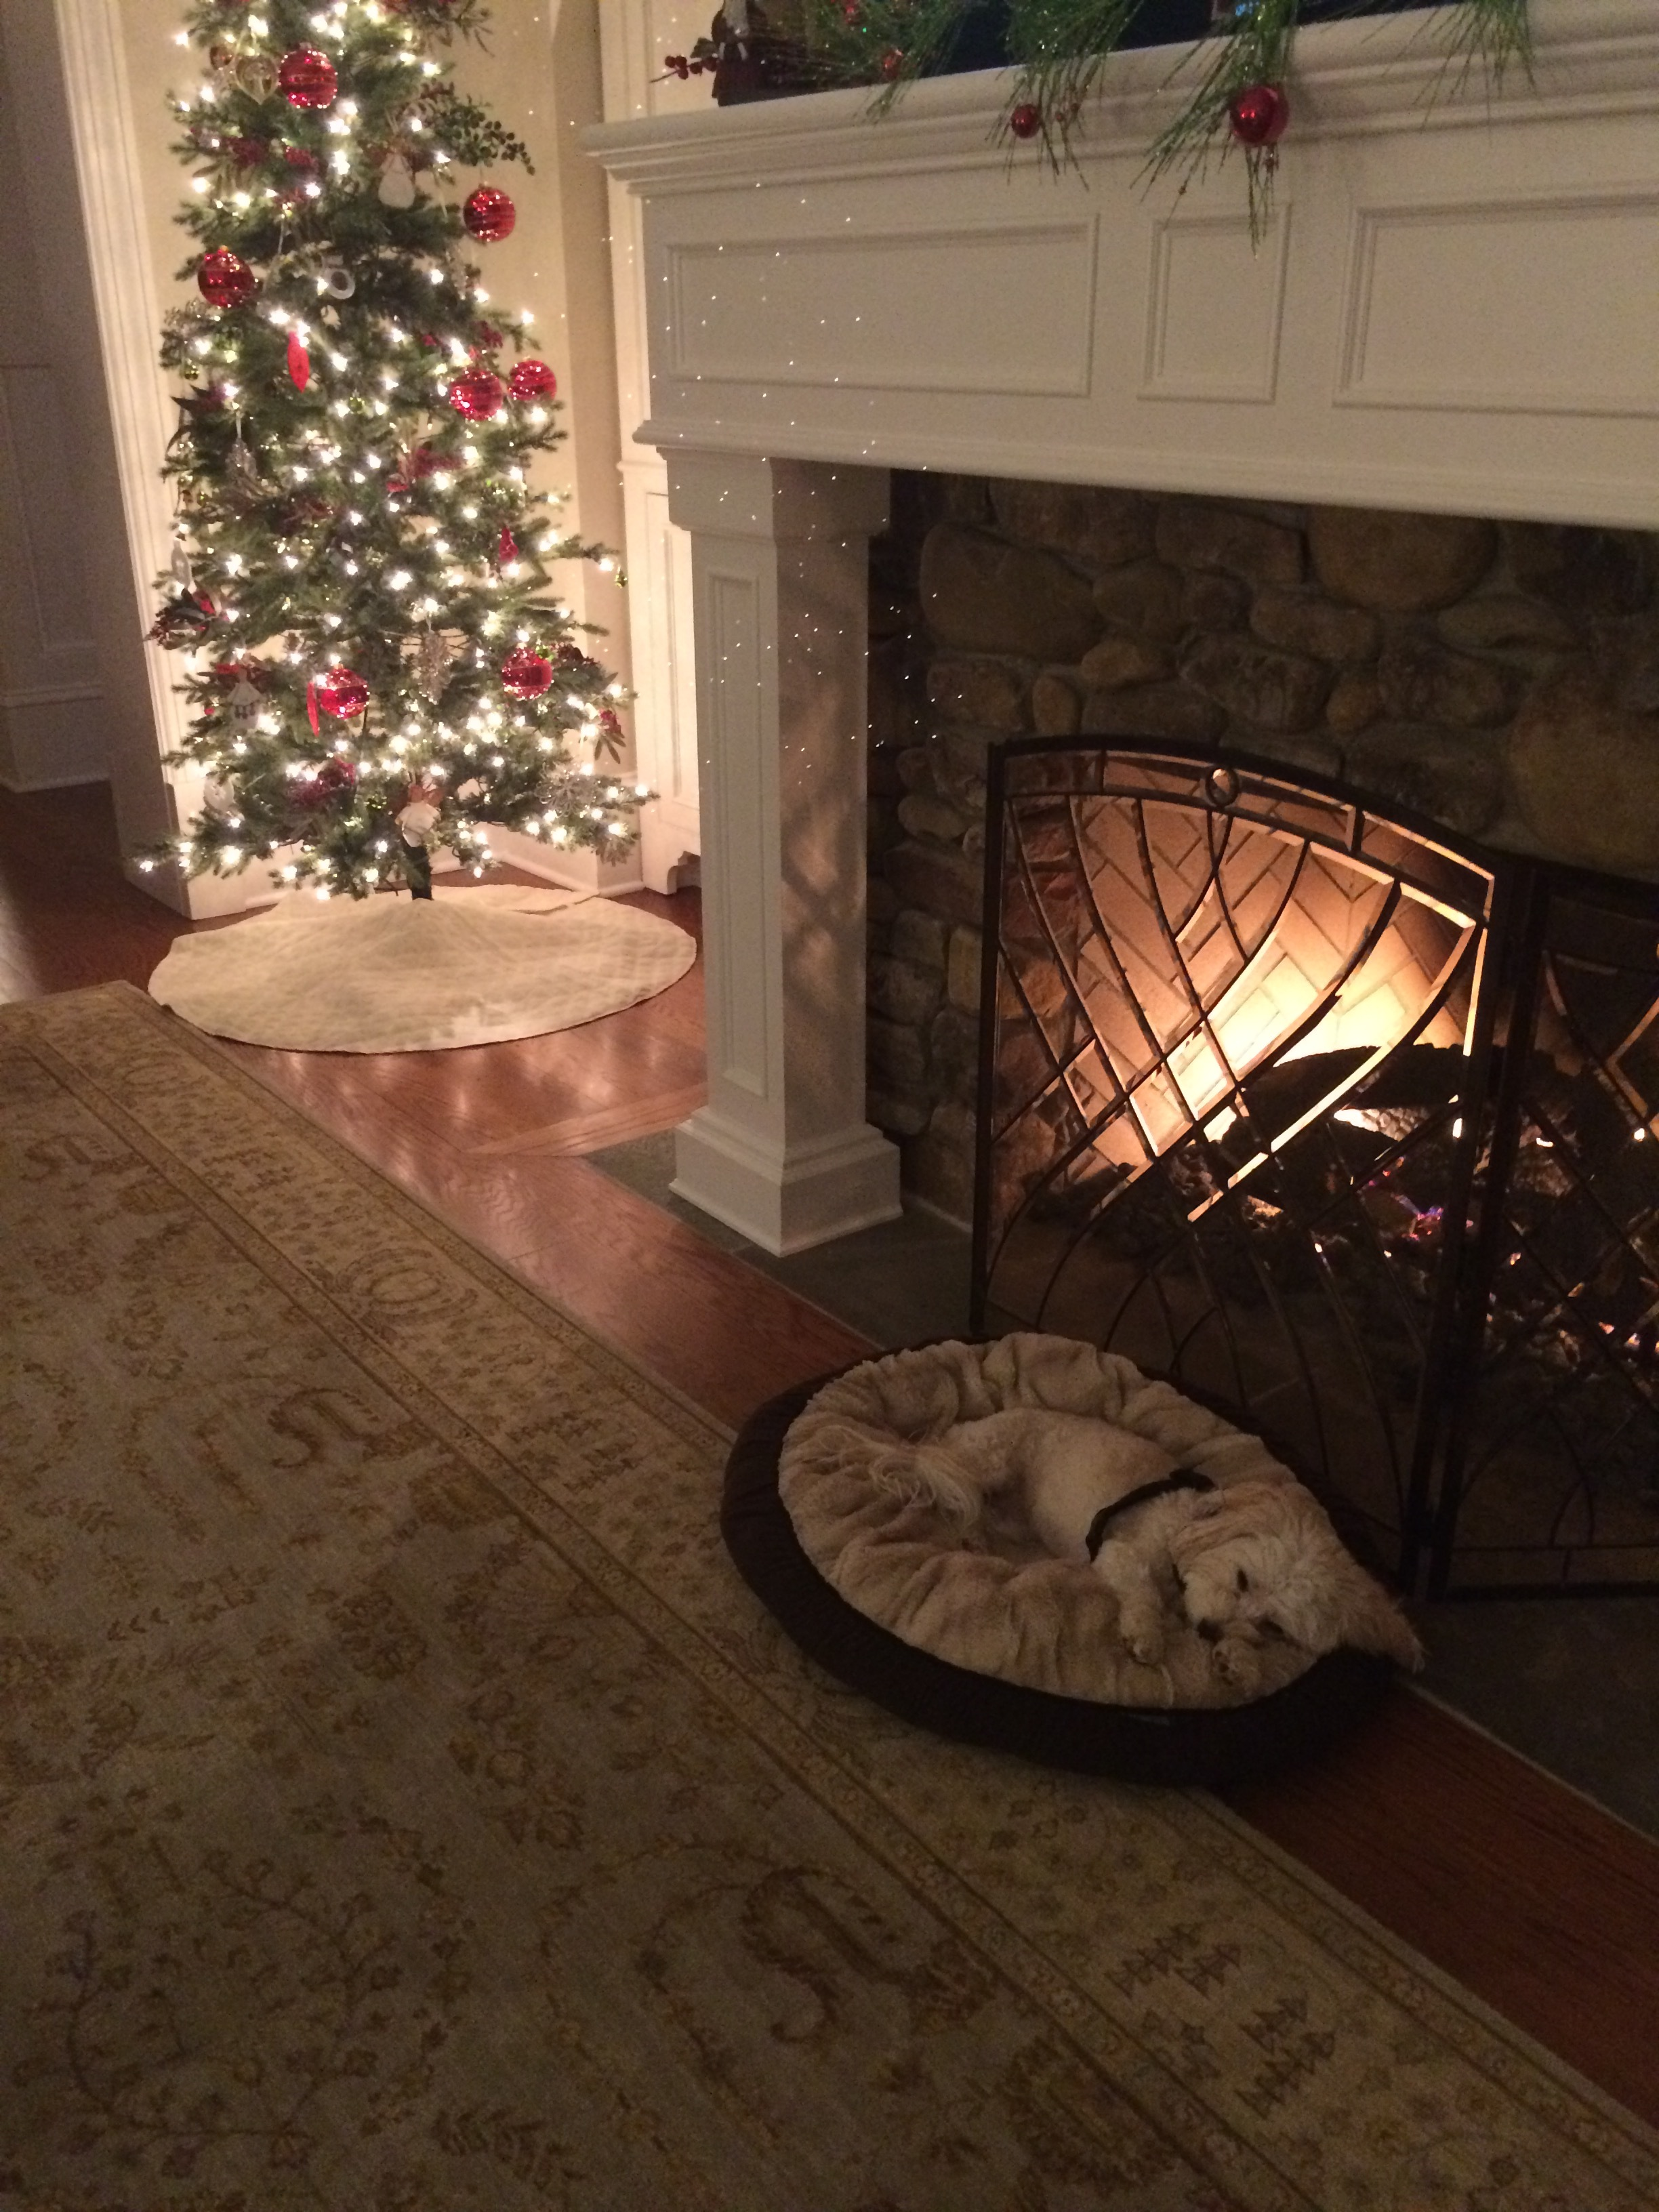 Abigail Brown waiting for Santa!